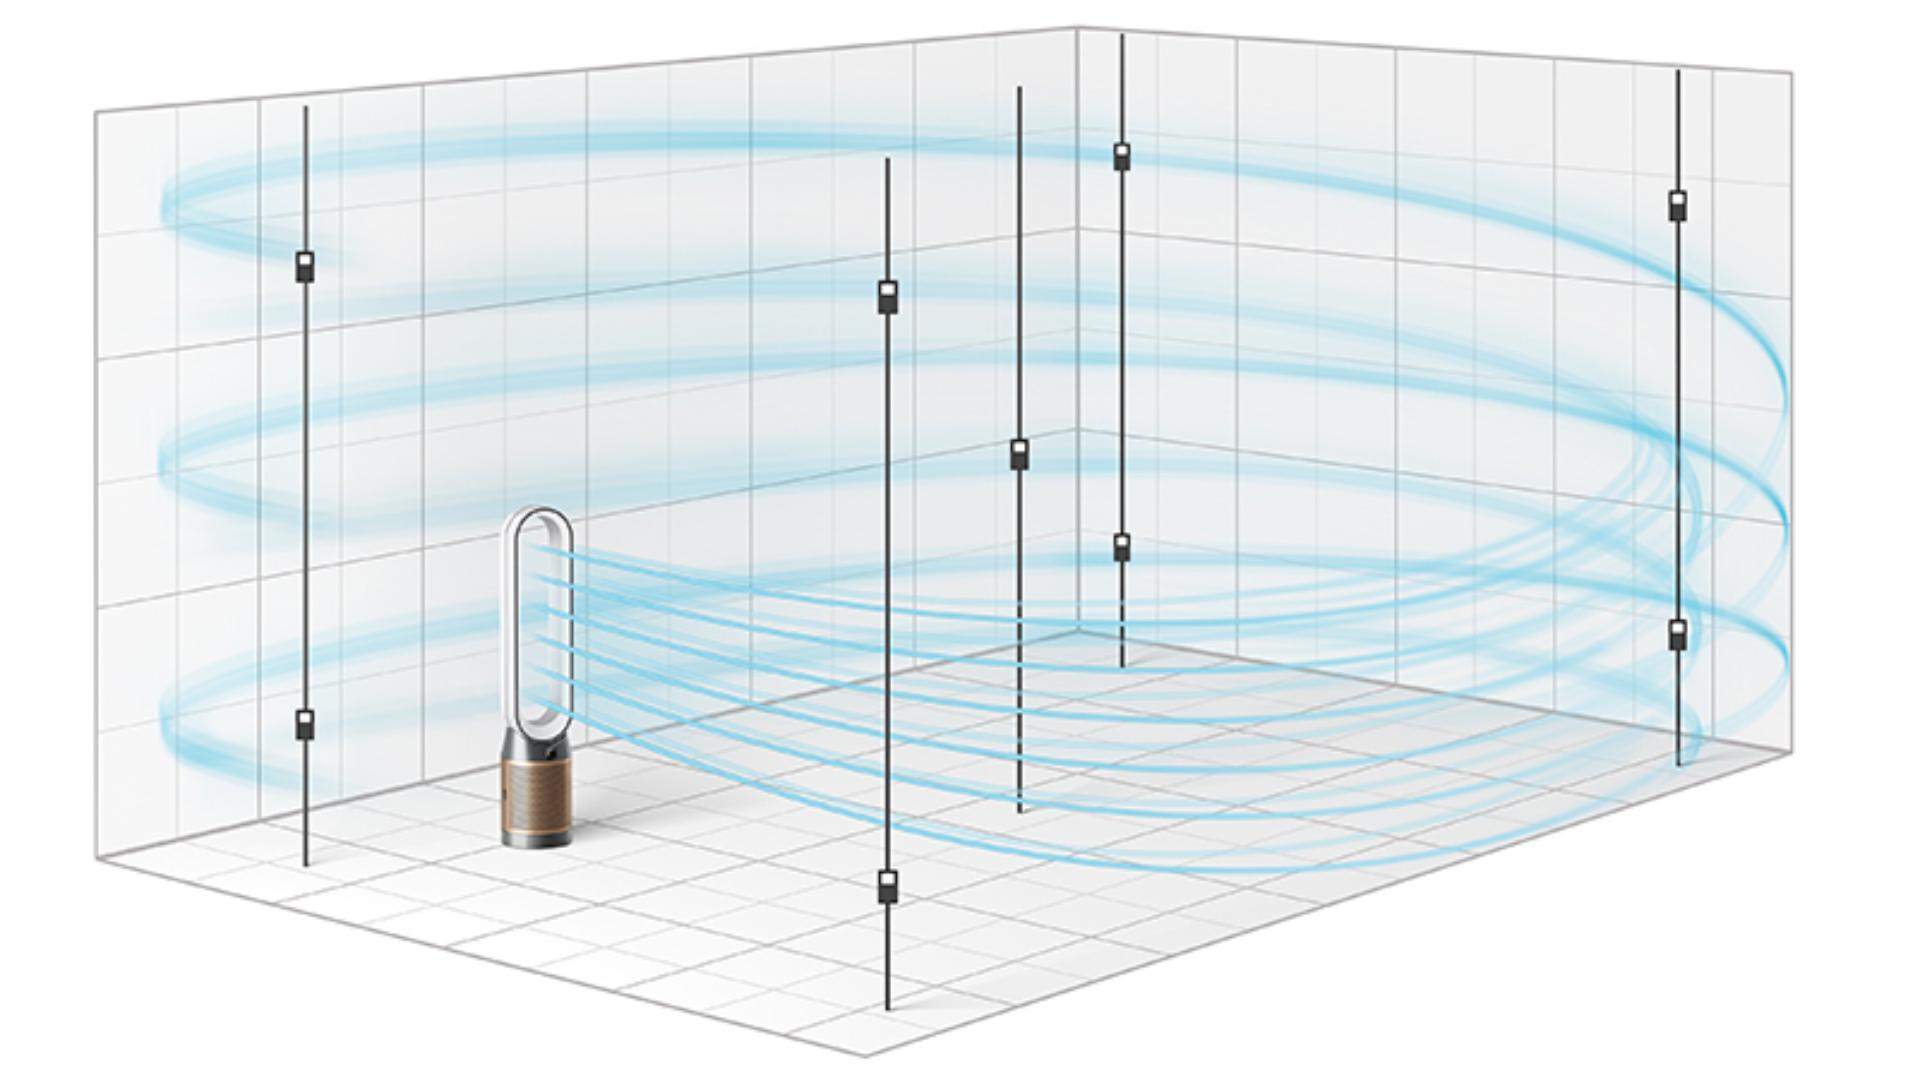 Graphic showing POLAR air circulation test method